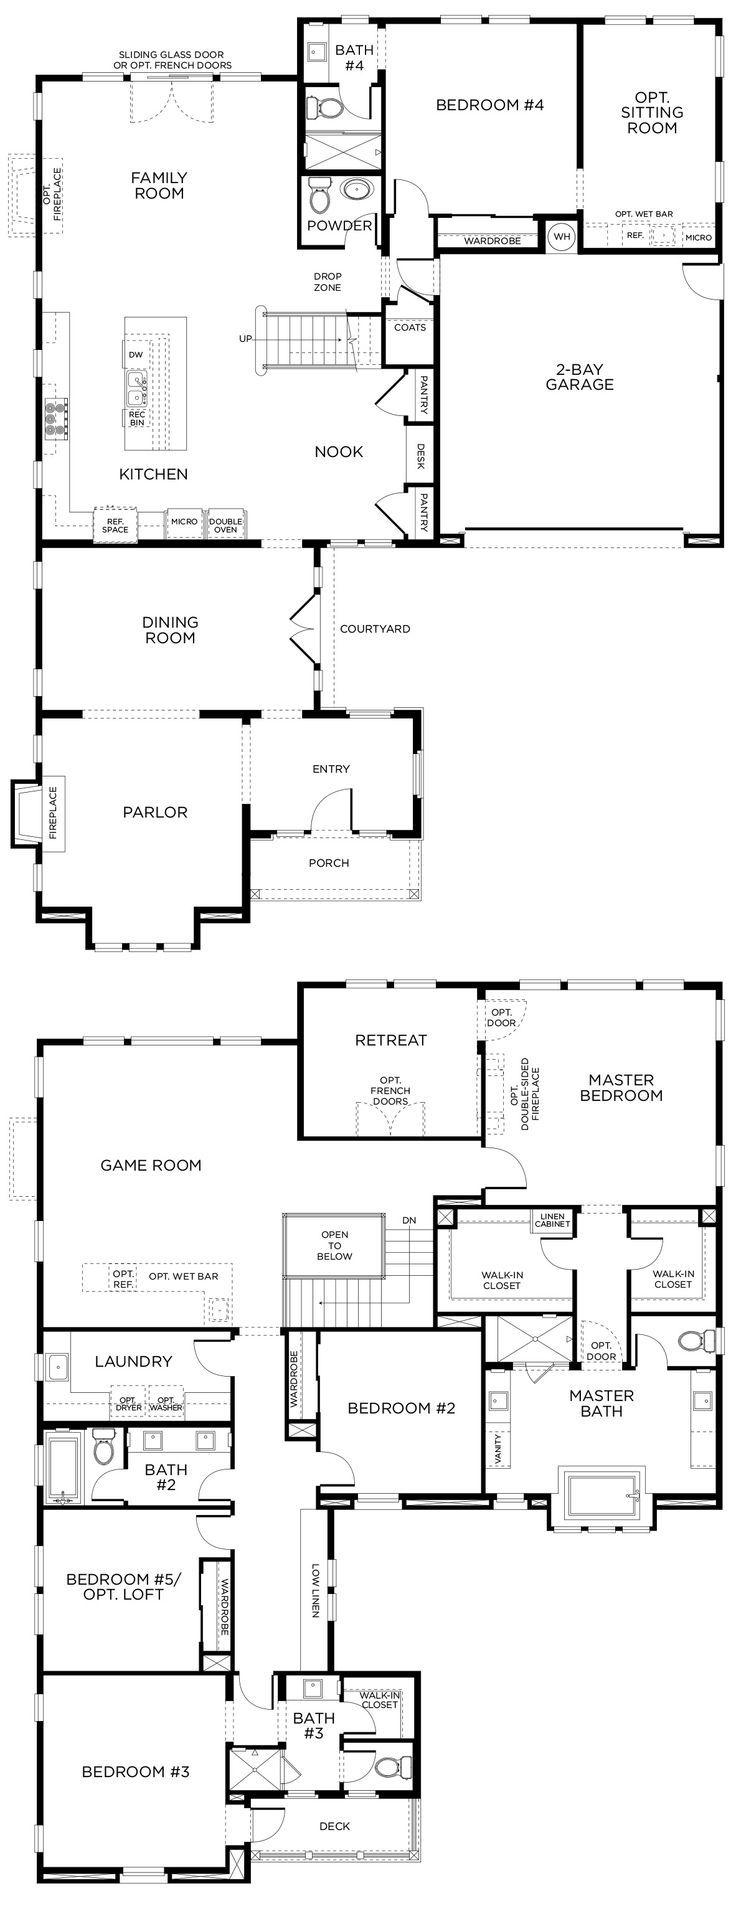 35 best luxurious floor plans images on pinterest house floor san diego luxury homes 5 bedrooms 45 bathrooms floor plans jameslax Images